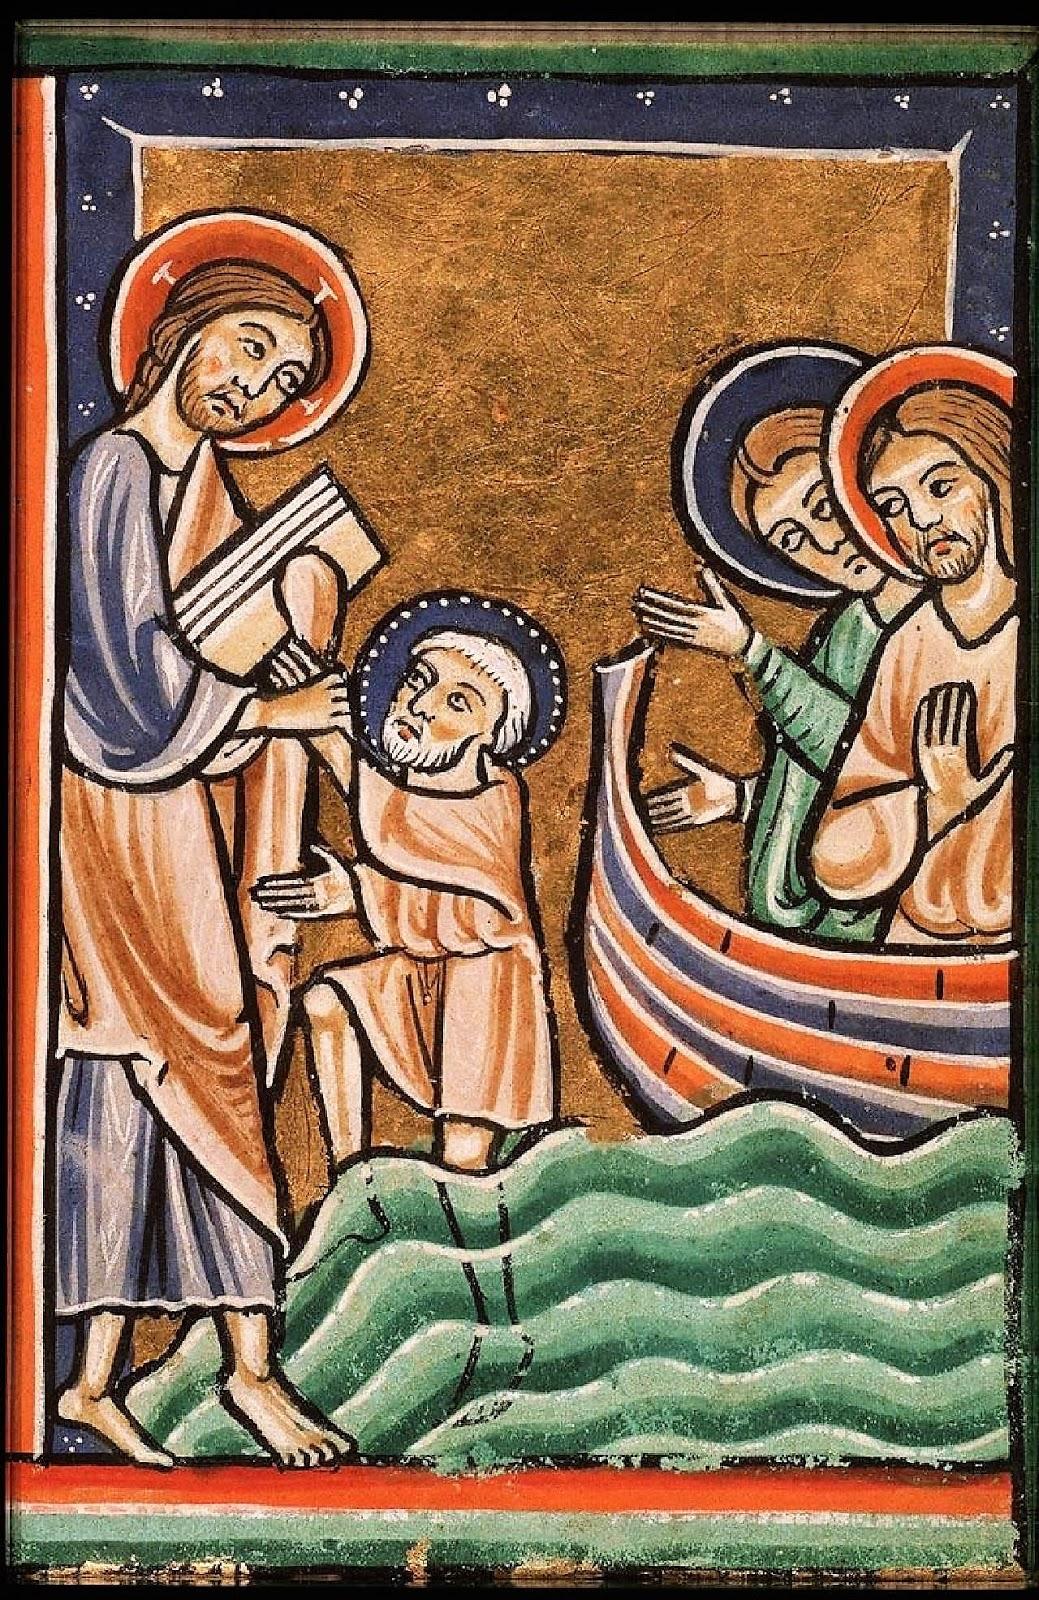 ad imaginem dei illustrating miracles walking on water